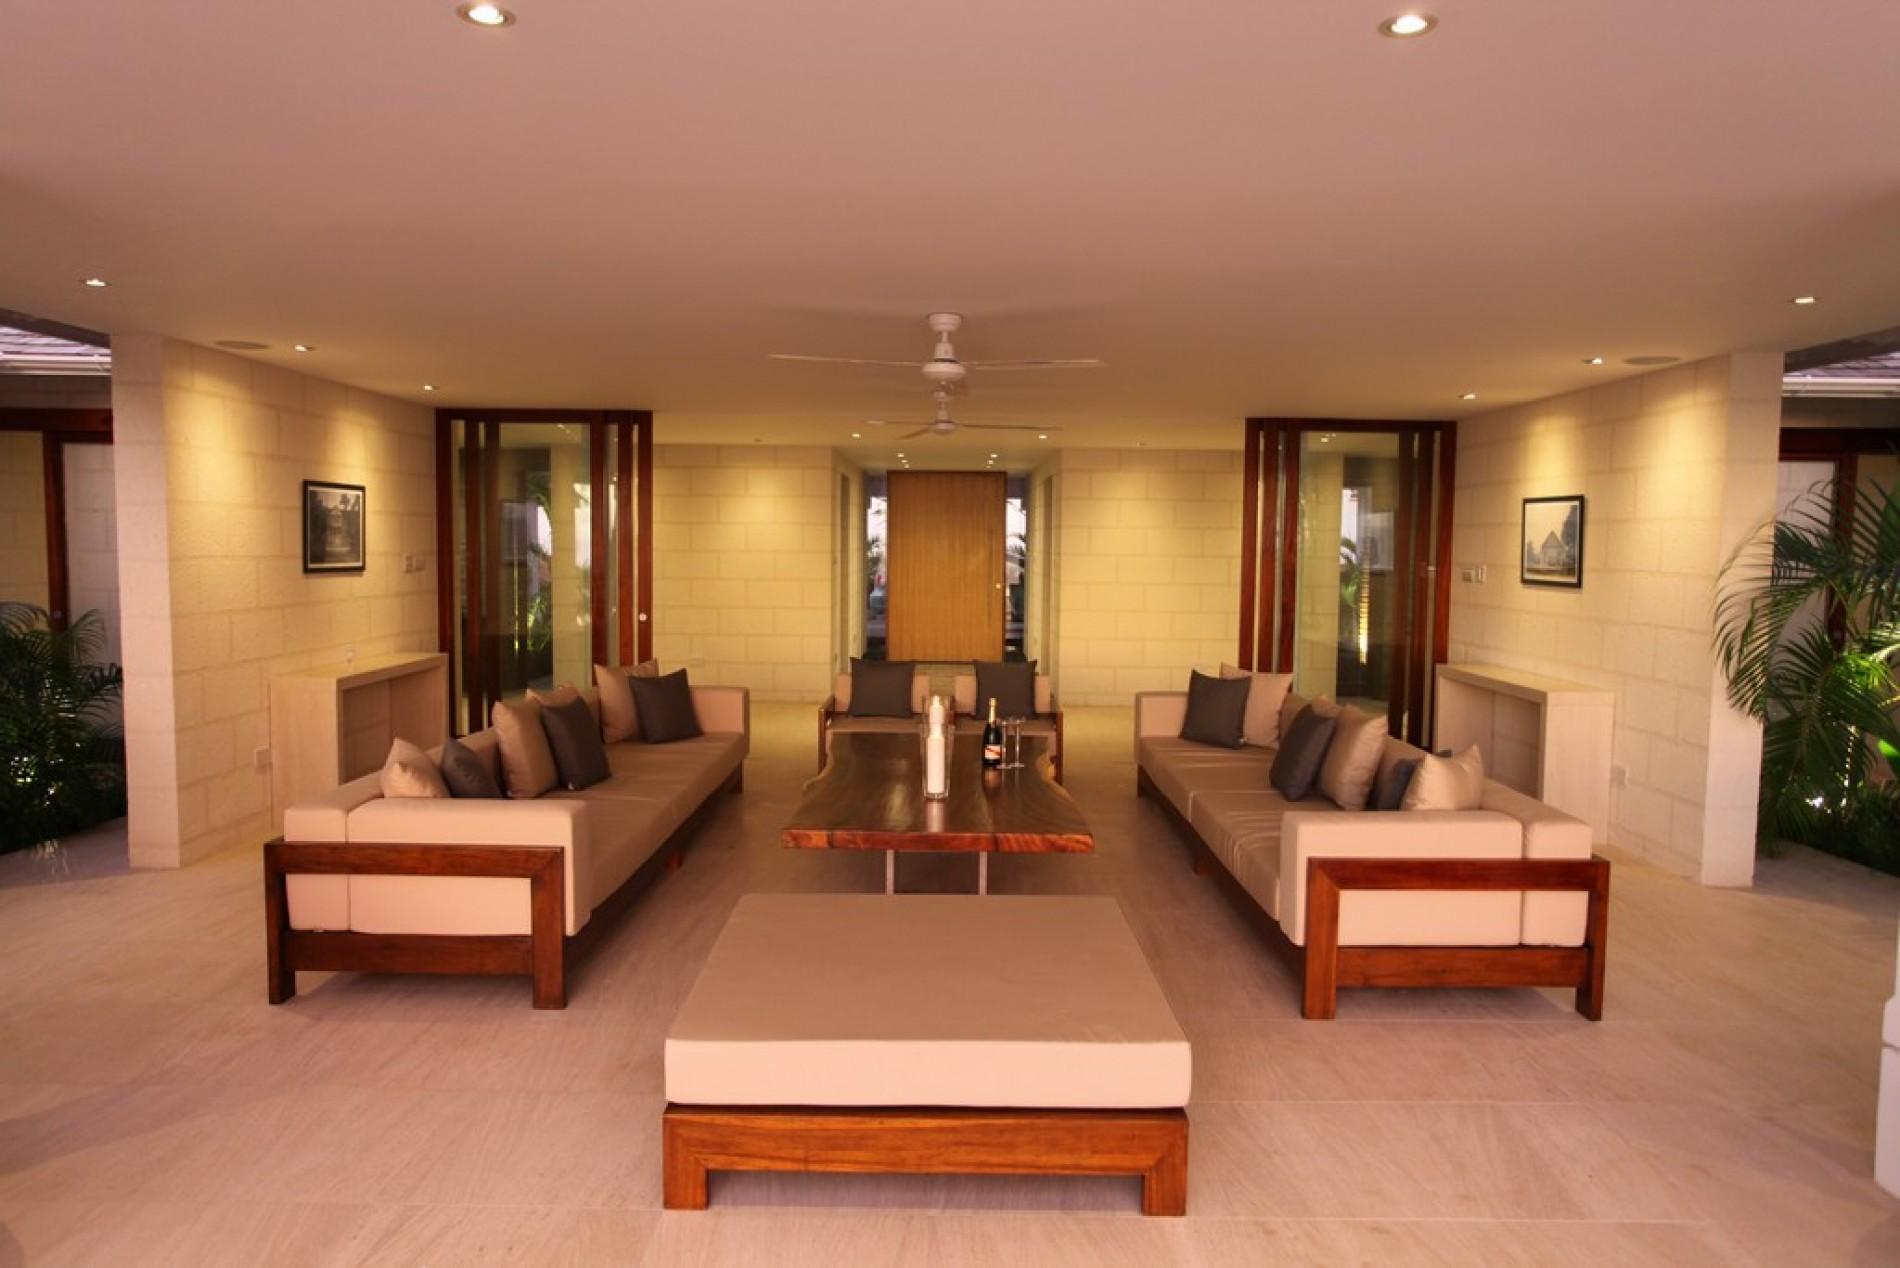 Elysium - 6 Bedrooms - Luxury Villa